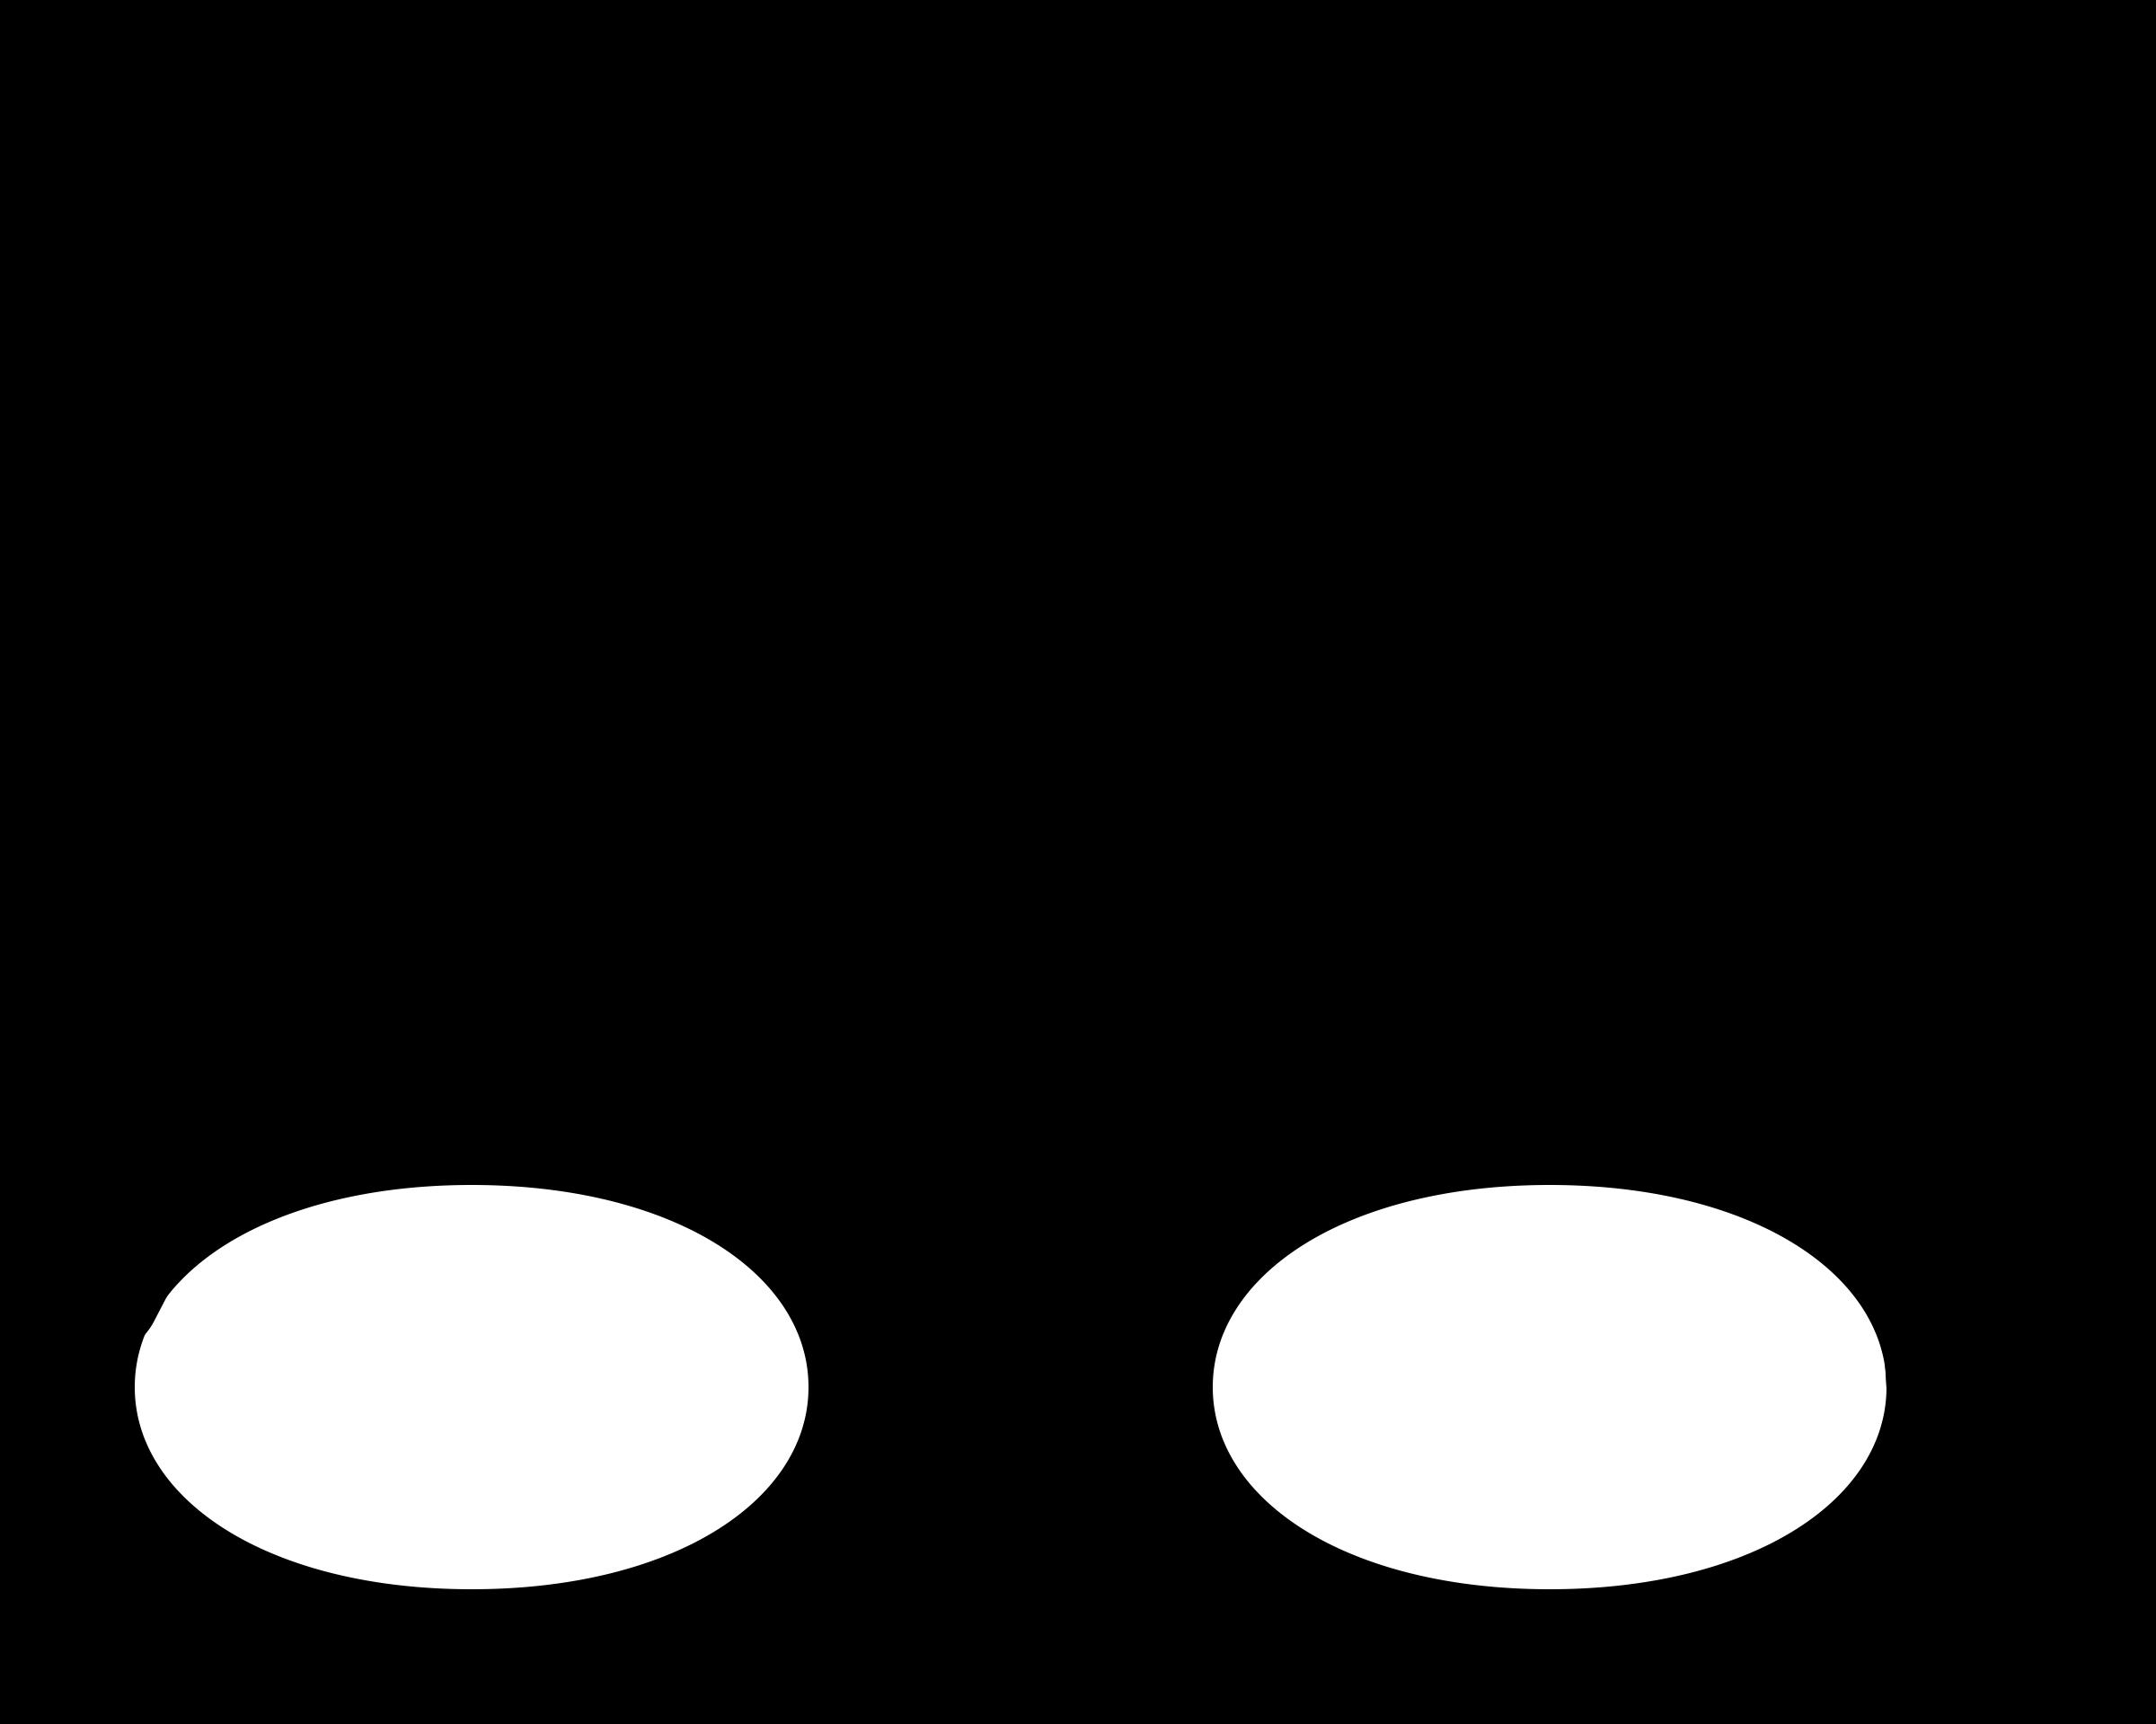 Clipart glasses car. Big image png